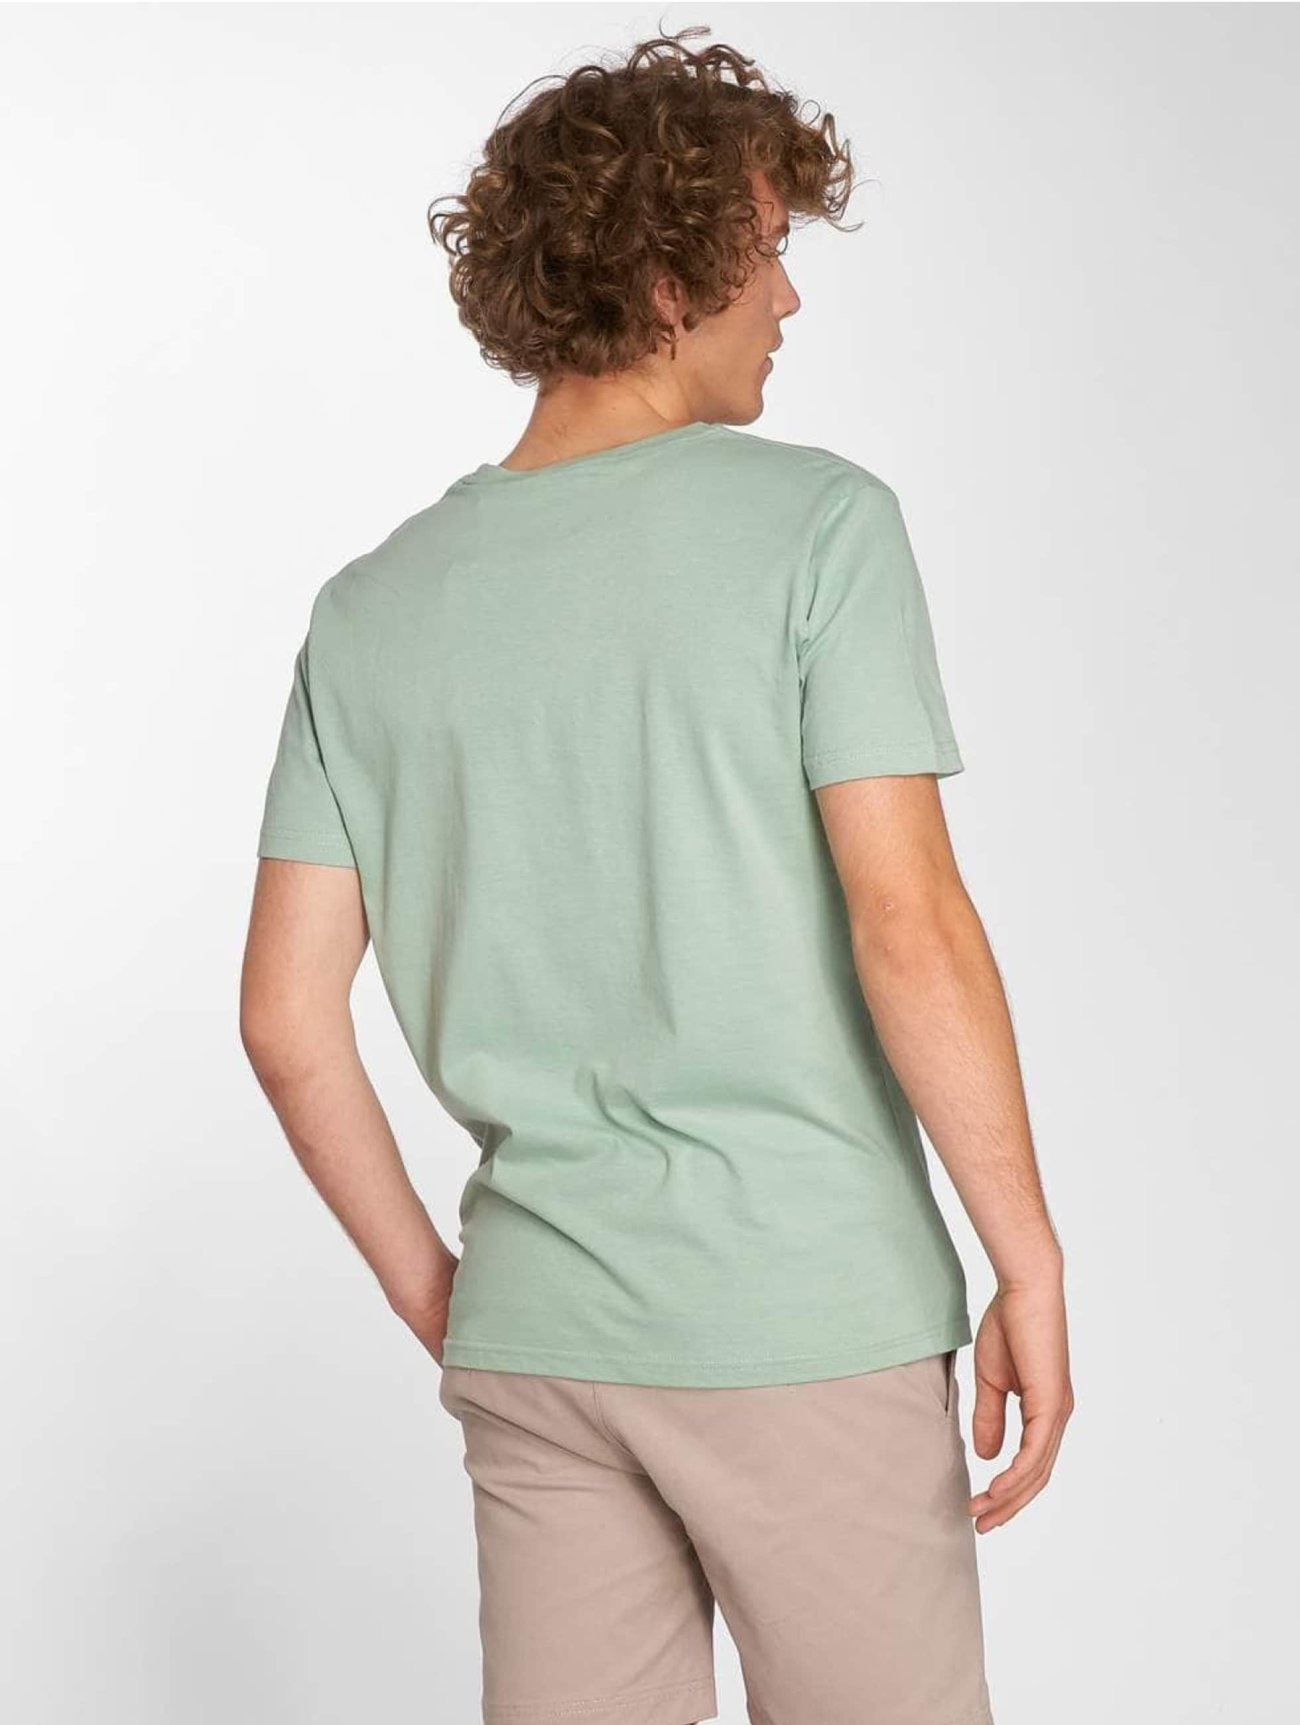 Just Rhyse | La Arena  turquoise Homme T-Shirt  407907| Homme Hauts